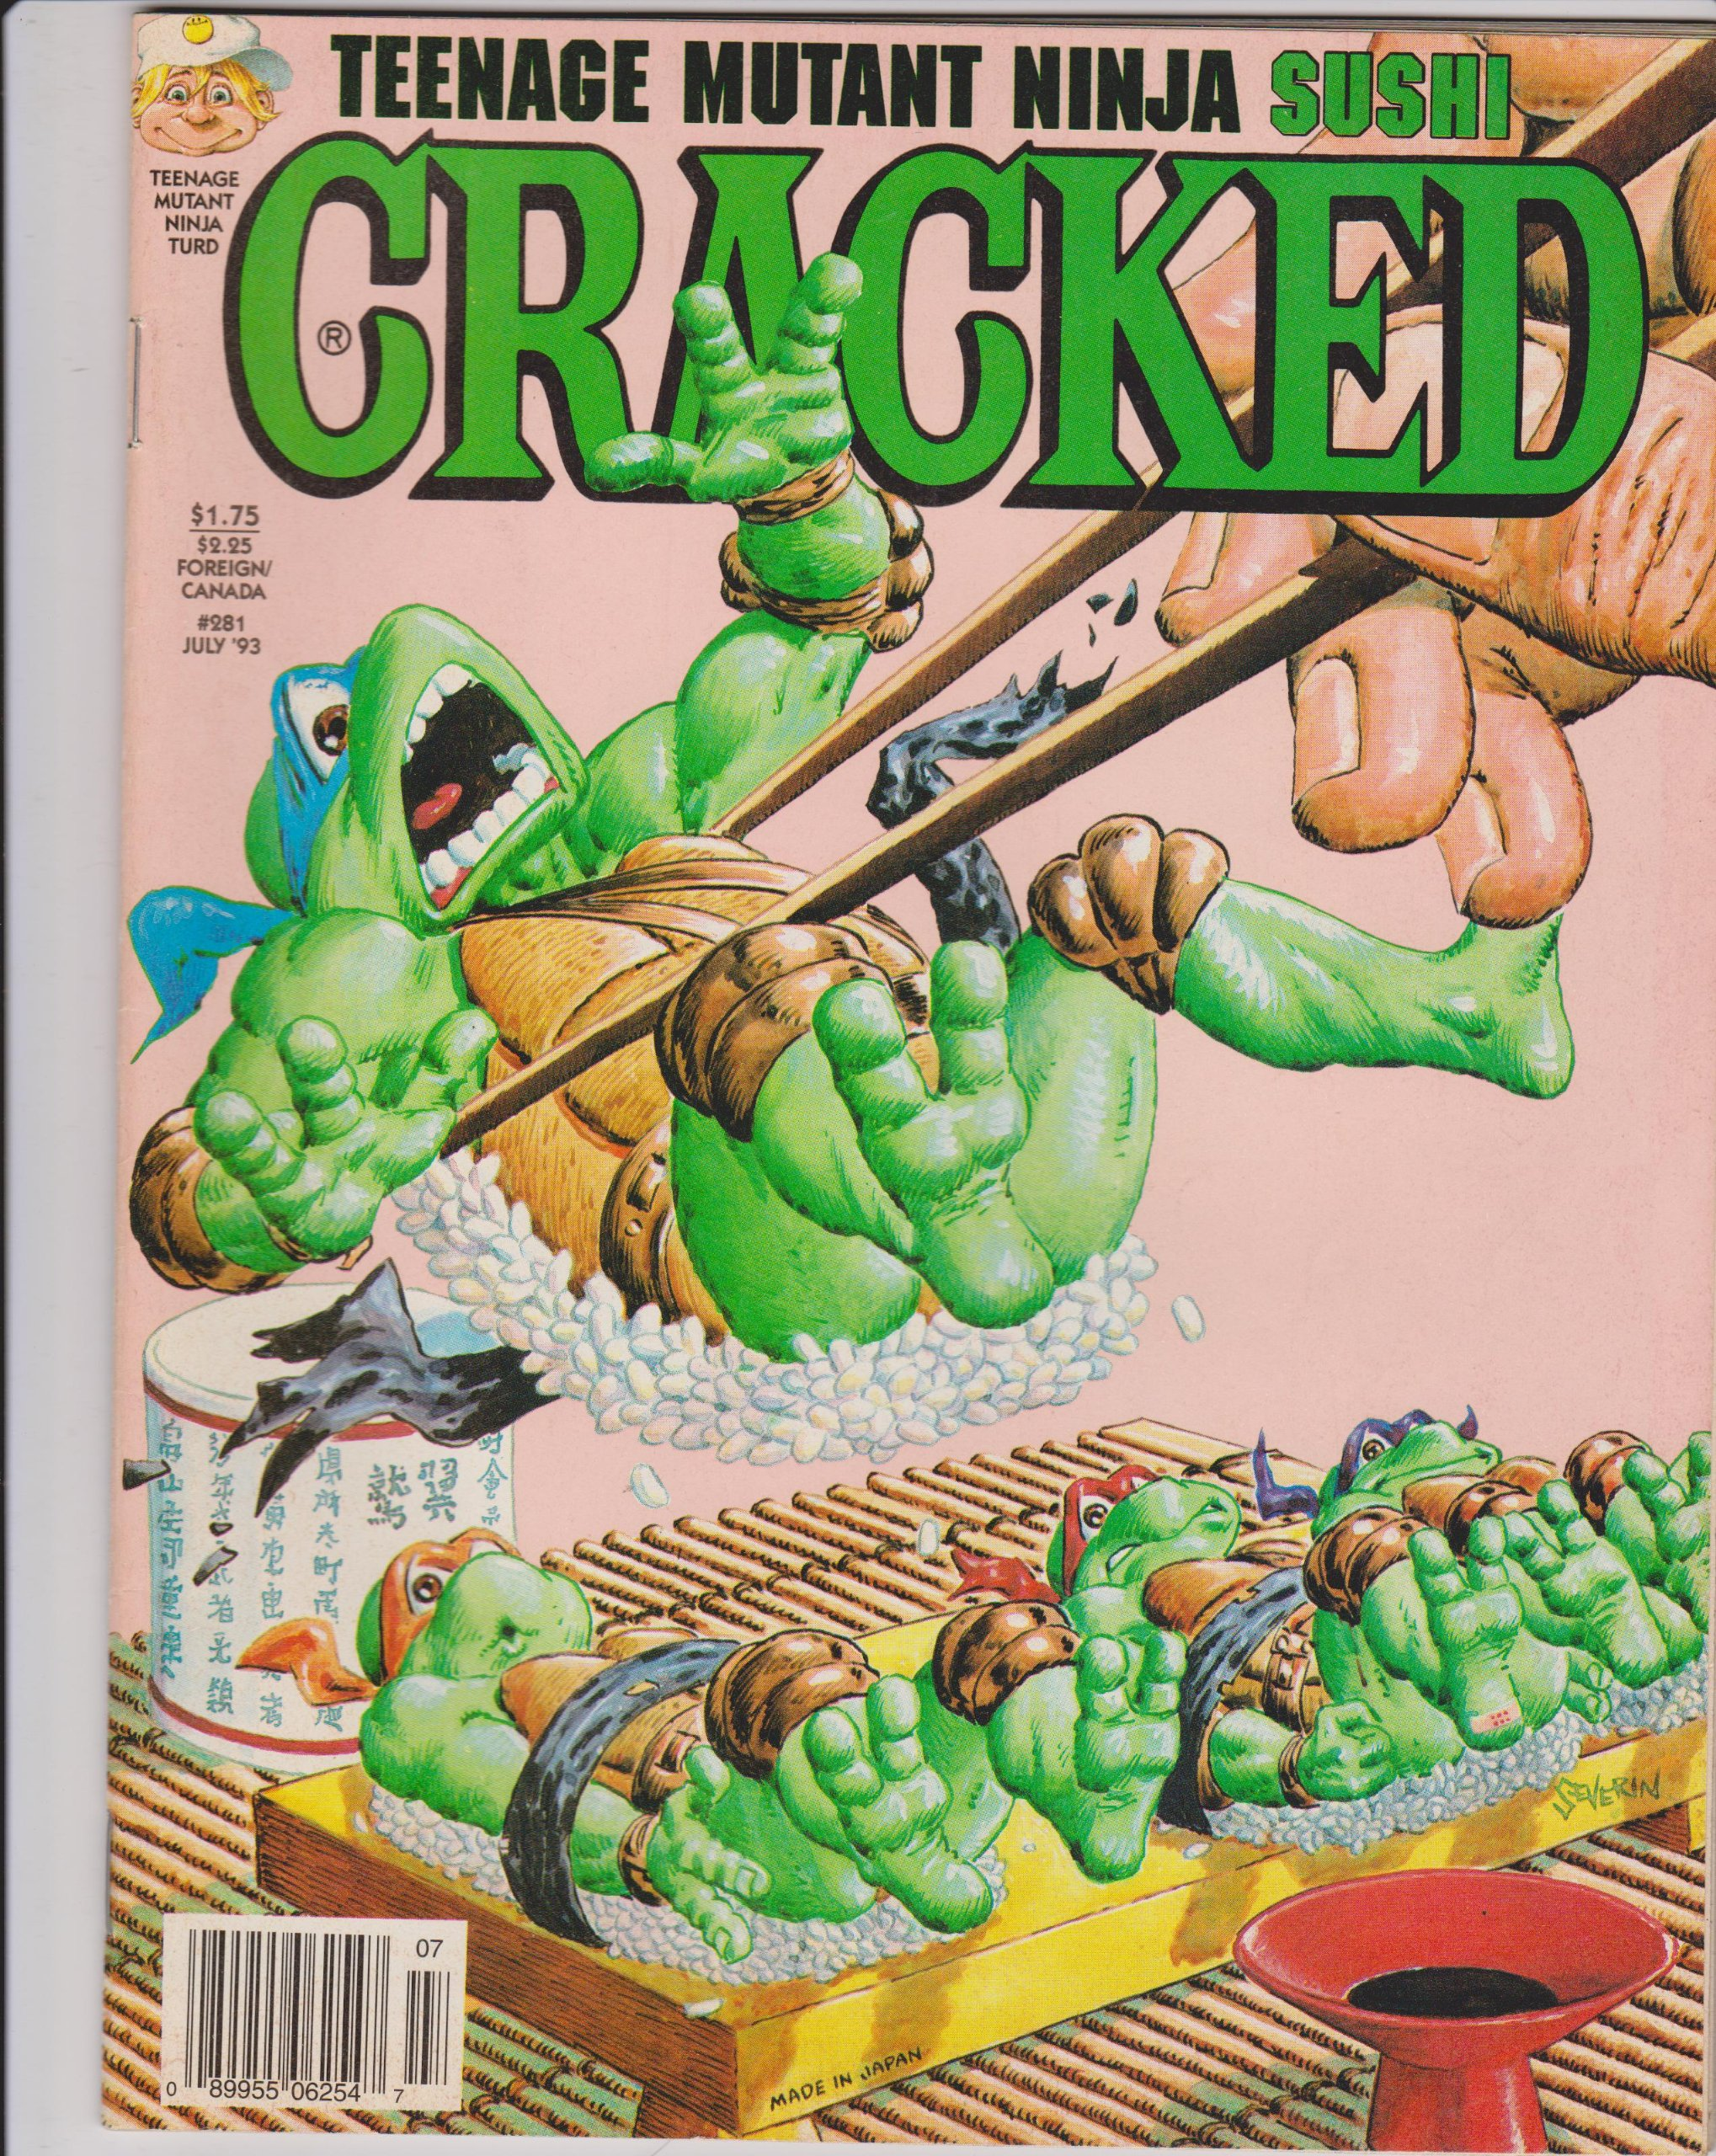 Cracked Teenage Mutant Ninja Sushi #281 July 93: Amazon.com ...